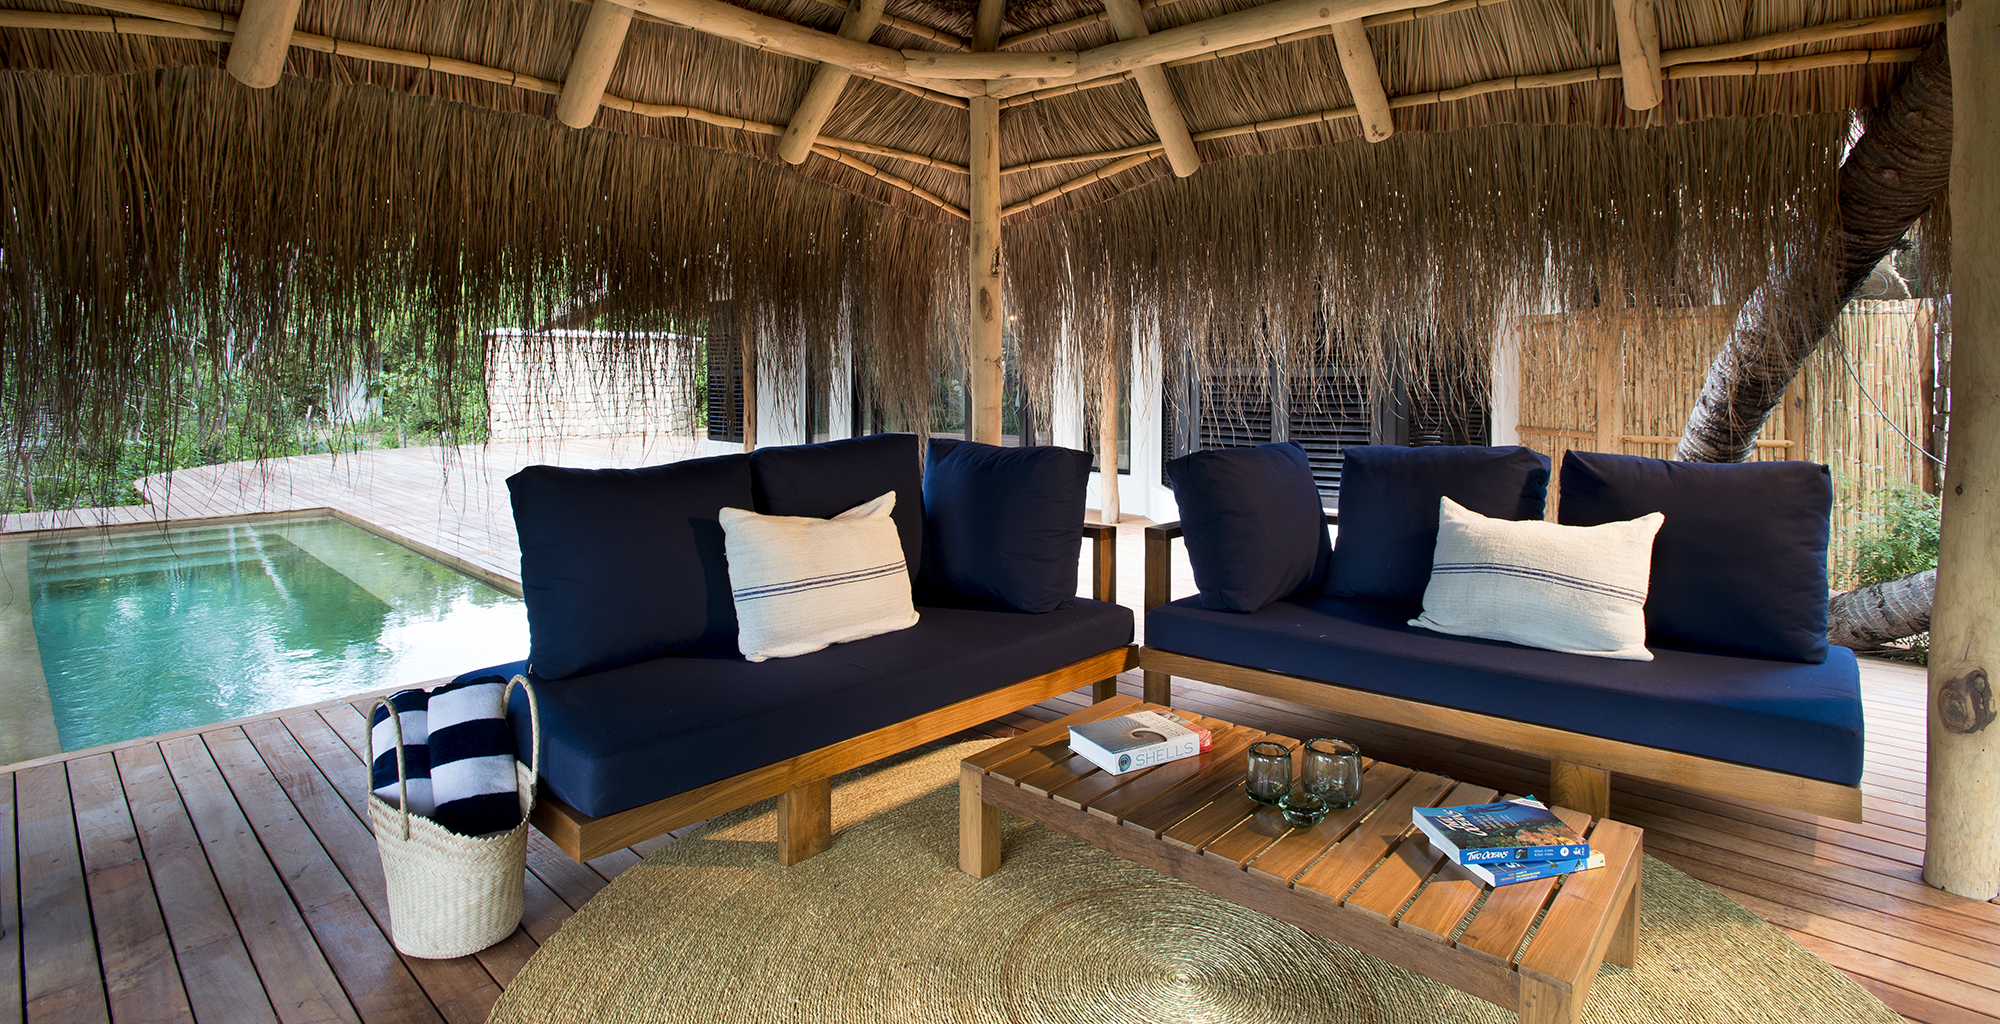 Mozambique-Bazaruto-Archipelago-Benguerra-Island-Lodge-Lounge